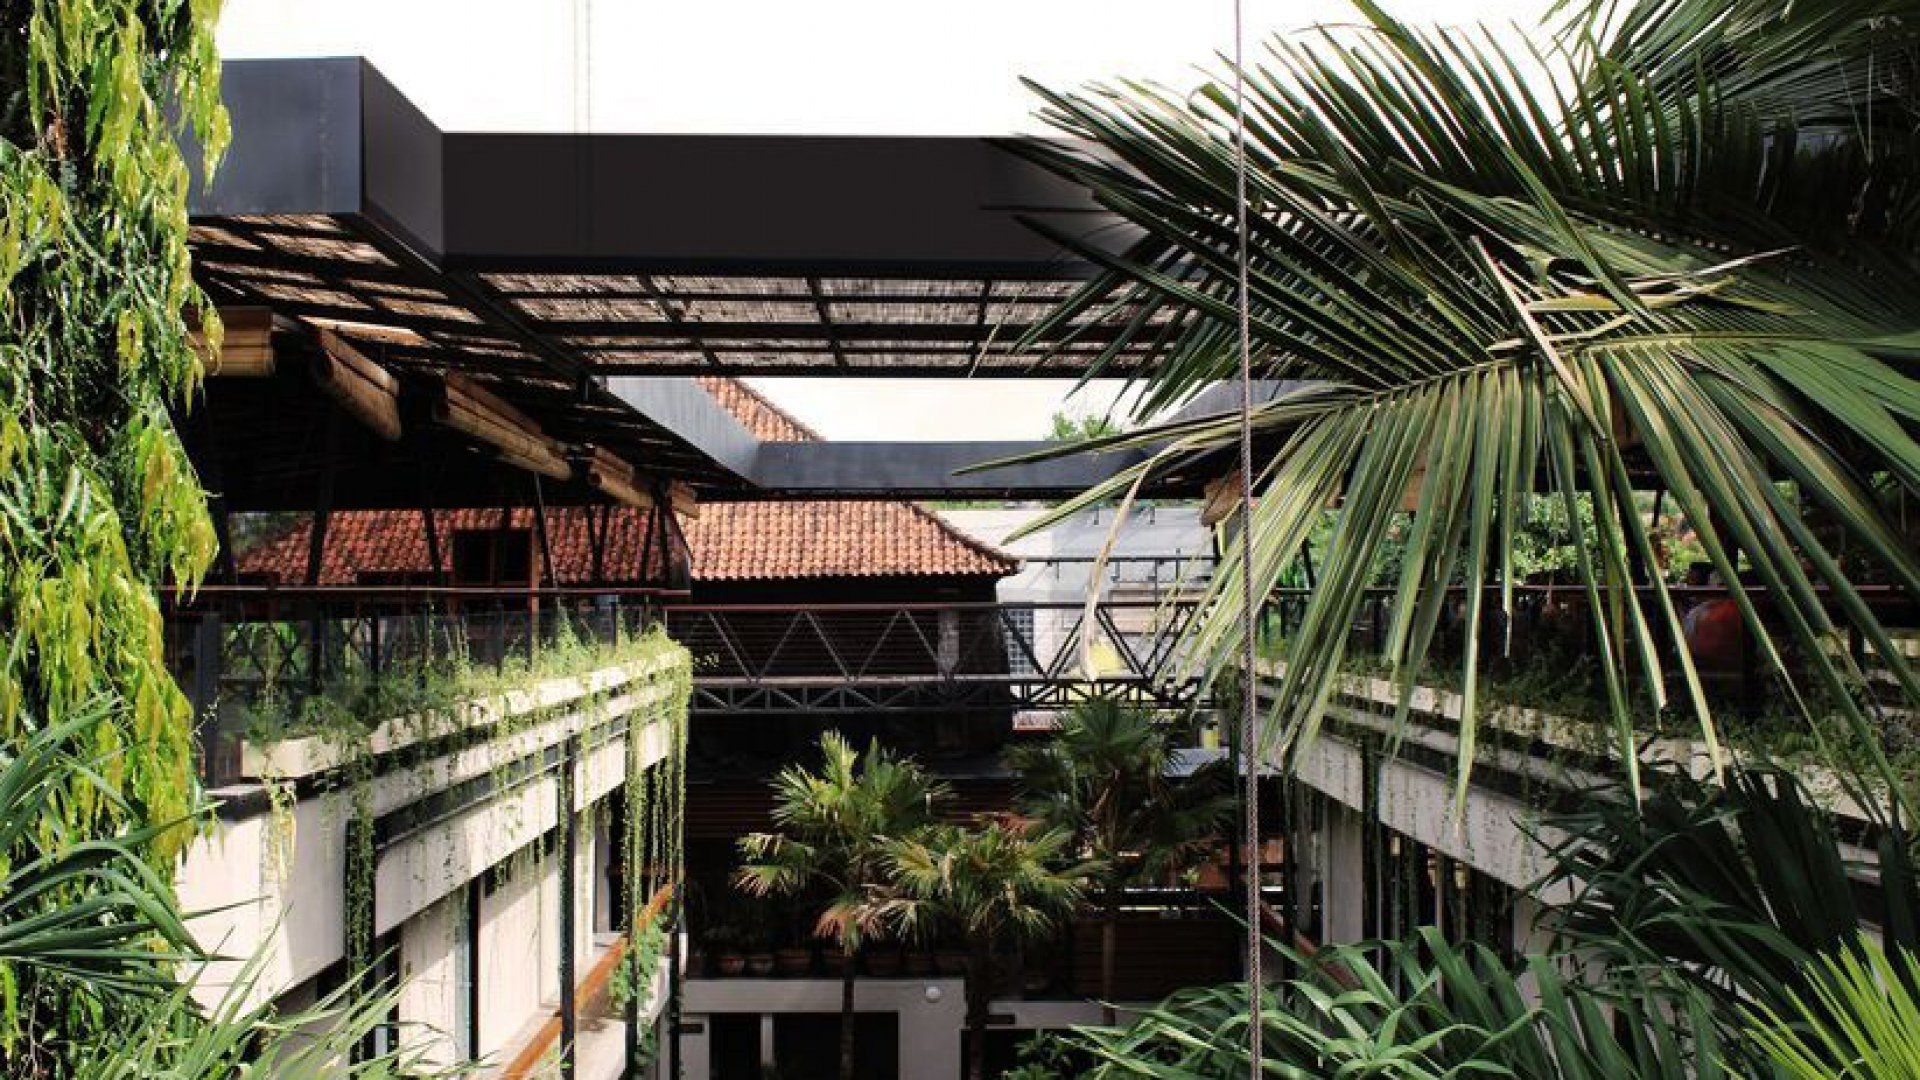 Roam's communal living space in Ubud, Bali.